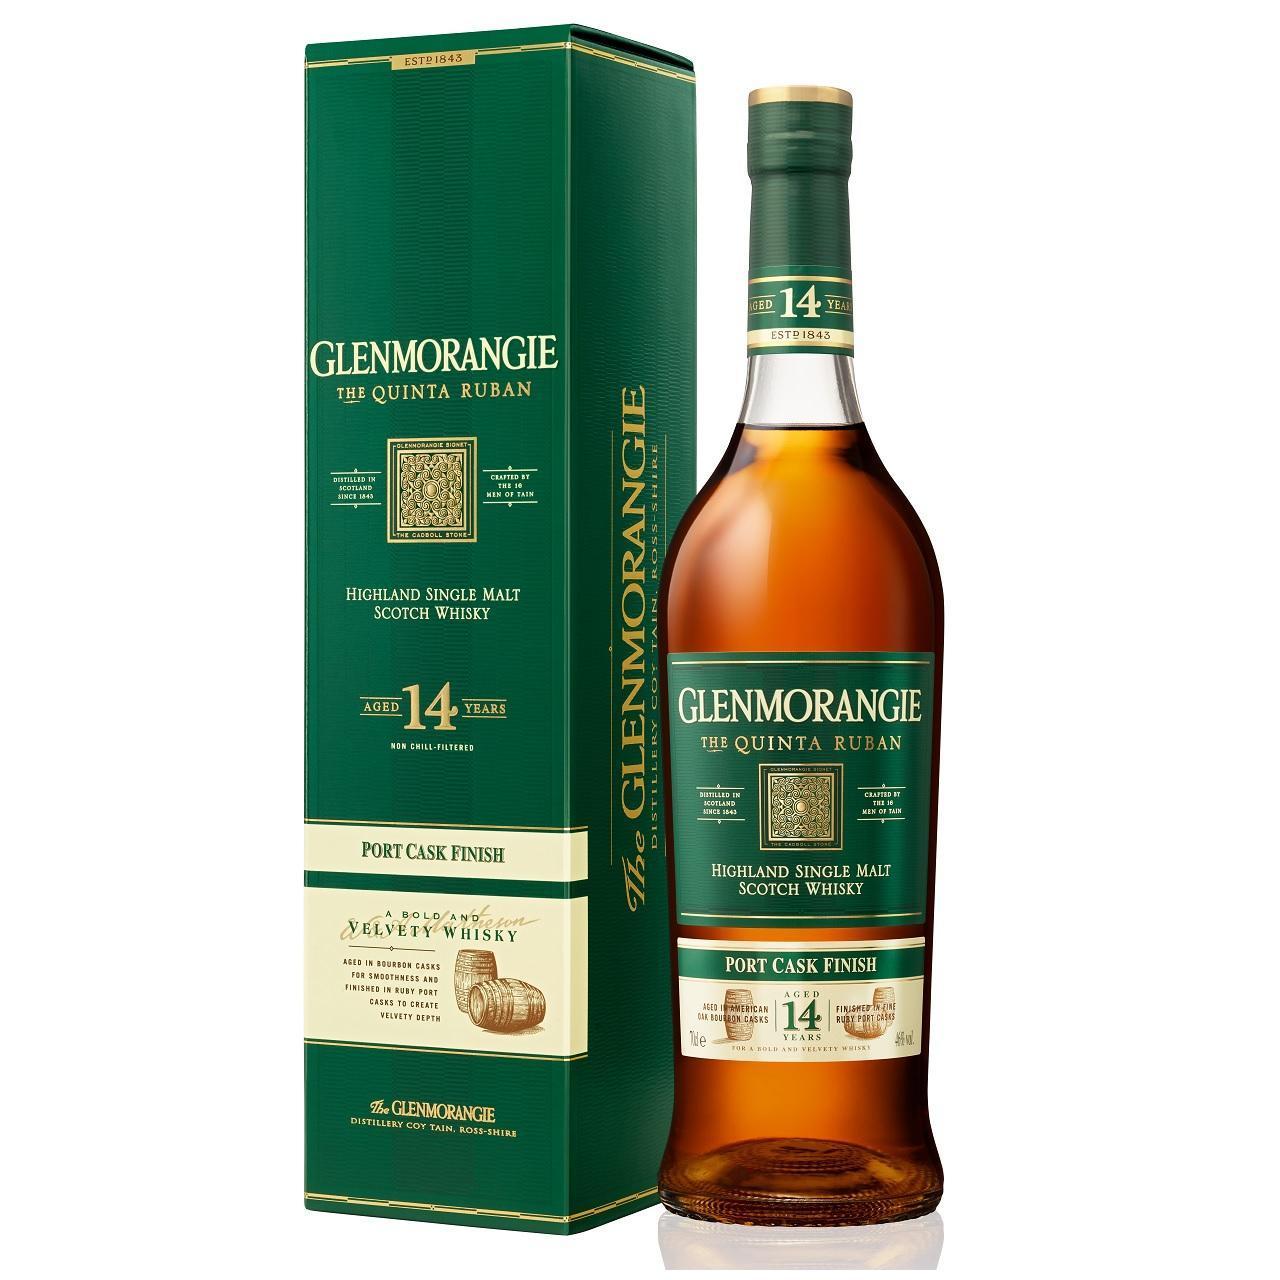 Glenmorangie Quinta Ruban Single Malt Scotch Whisky - £36 @ Ocado